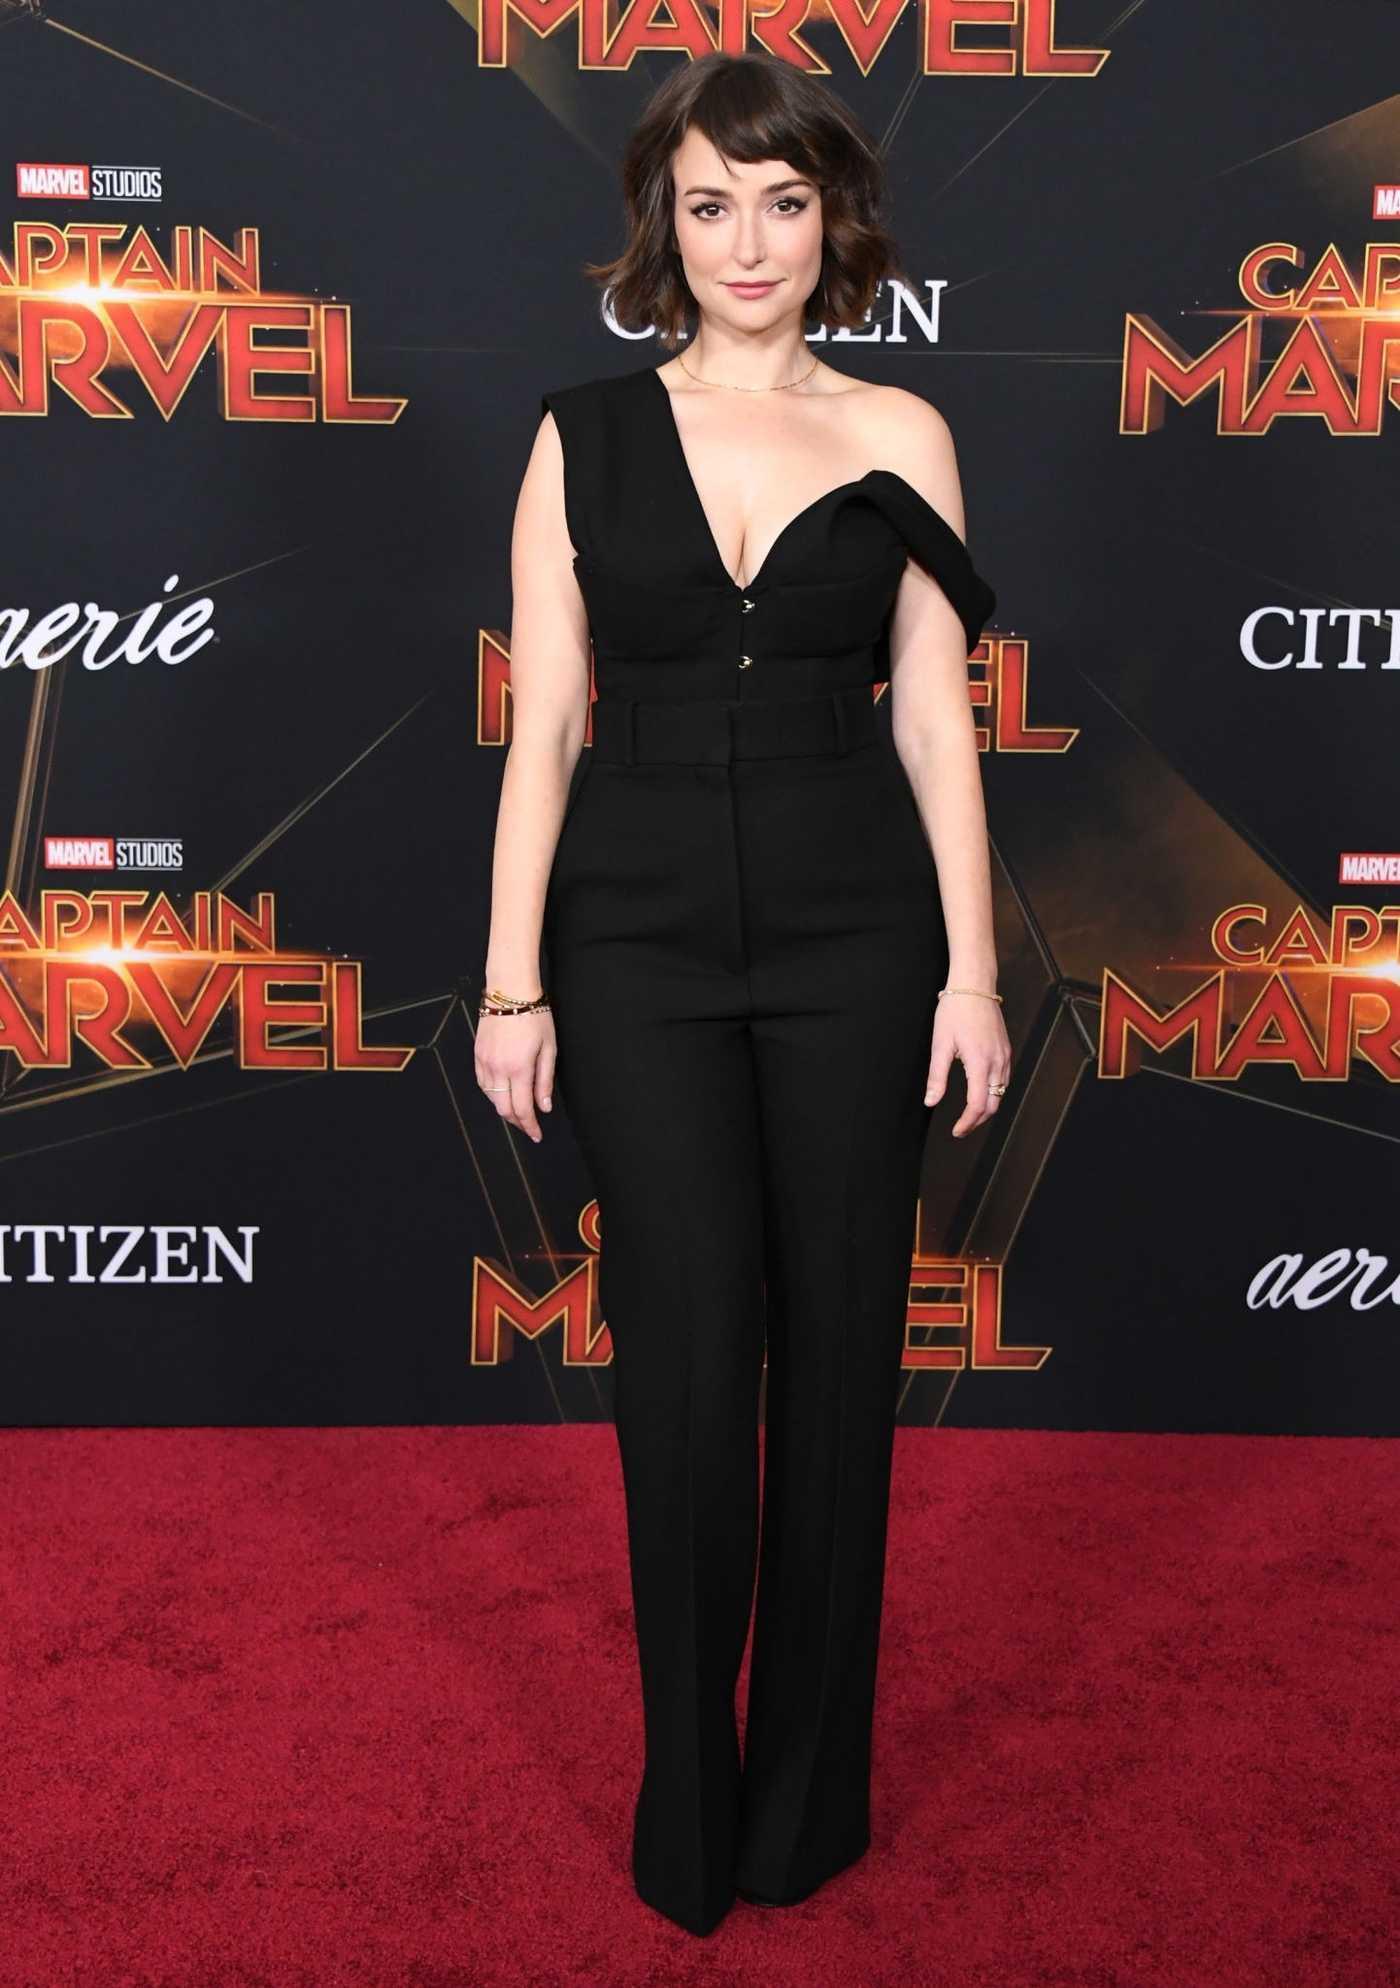 Milana Vayntrub Attends the Captain Marvel Premiere at the El Capitan Theatre in Los Angeles 03/04/2019